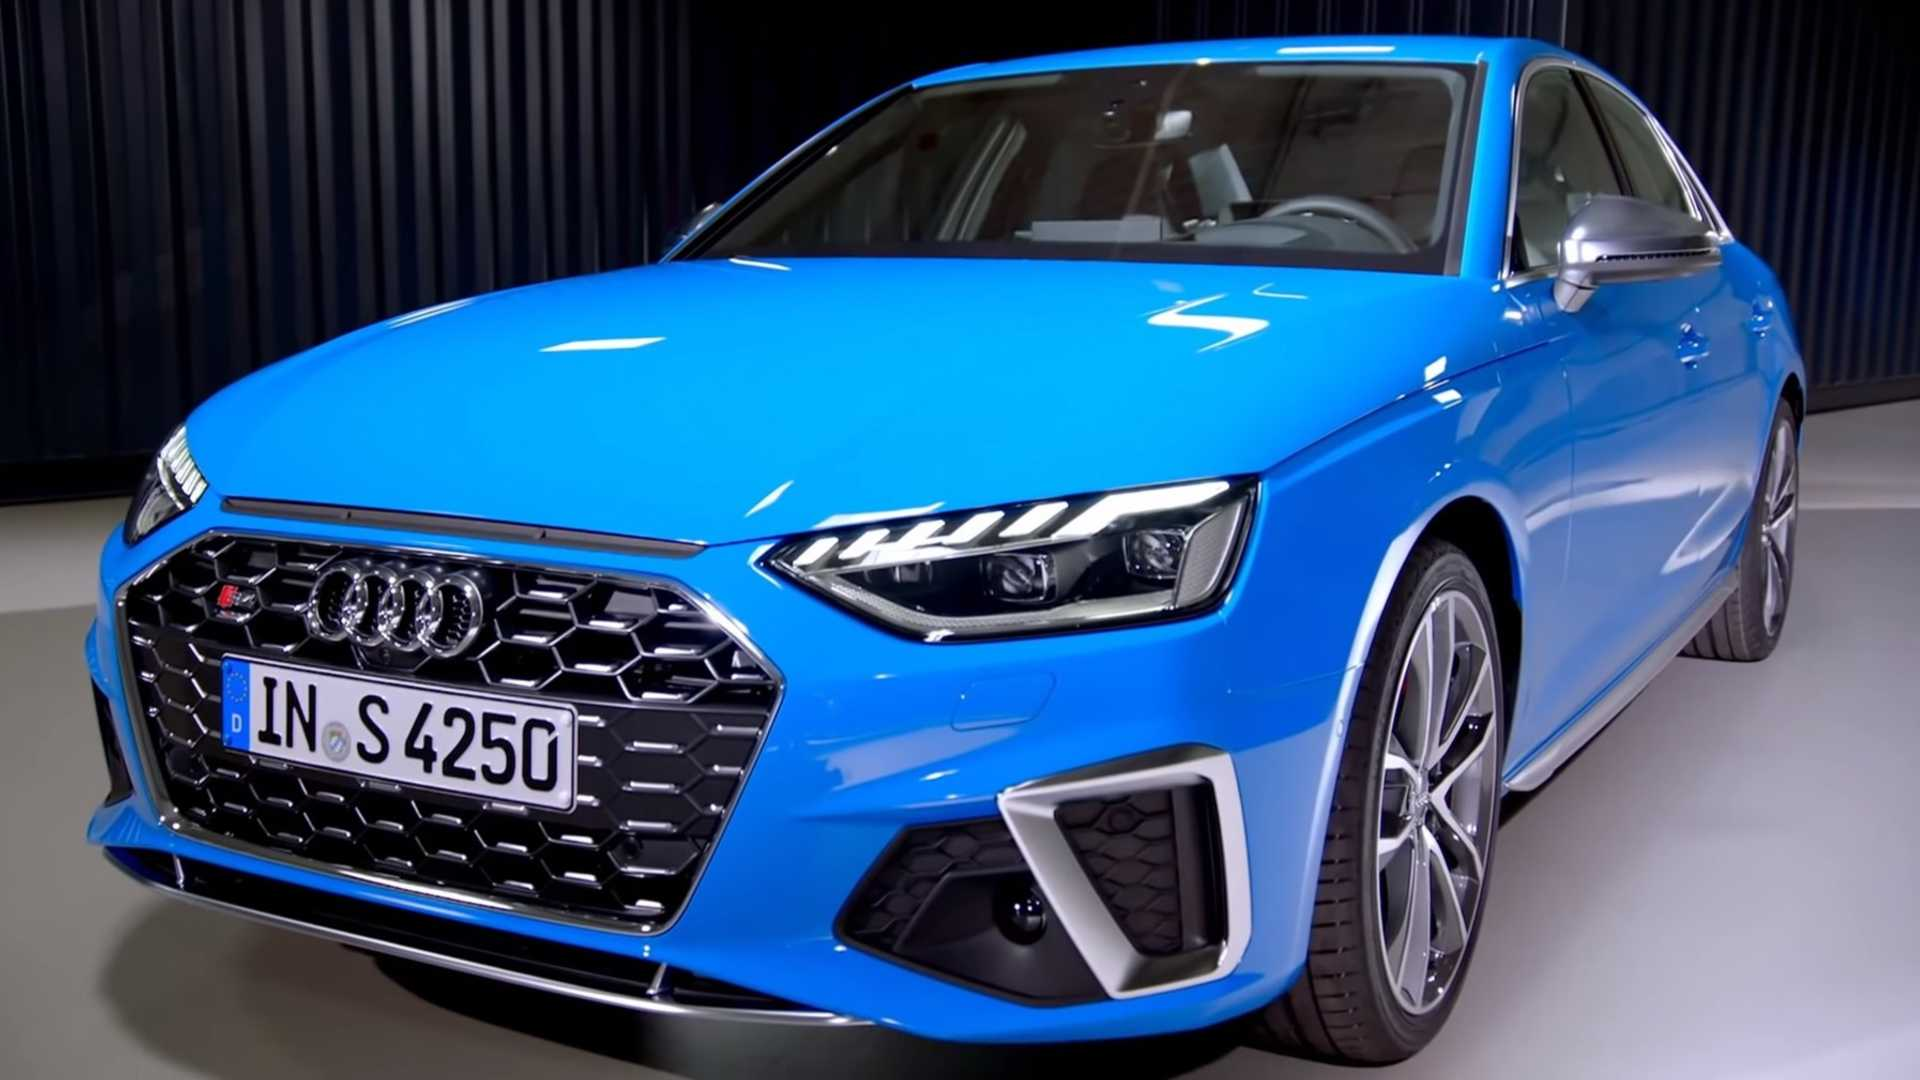 96 Great Audi F1 2020 History by Audi F1 2020